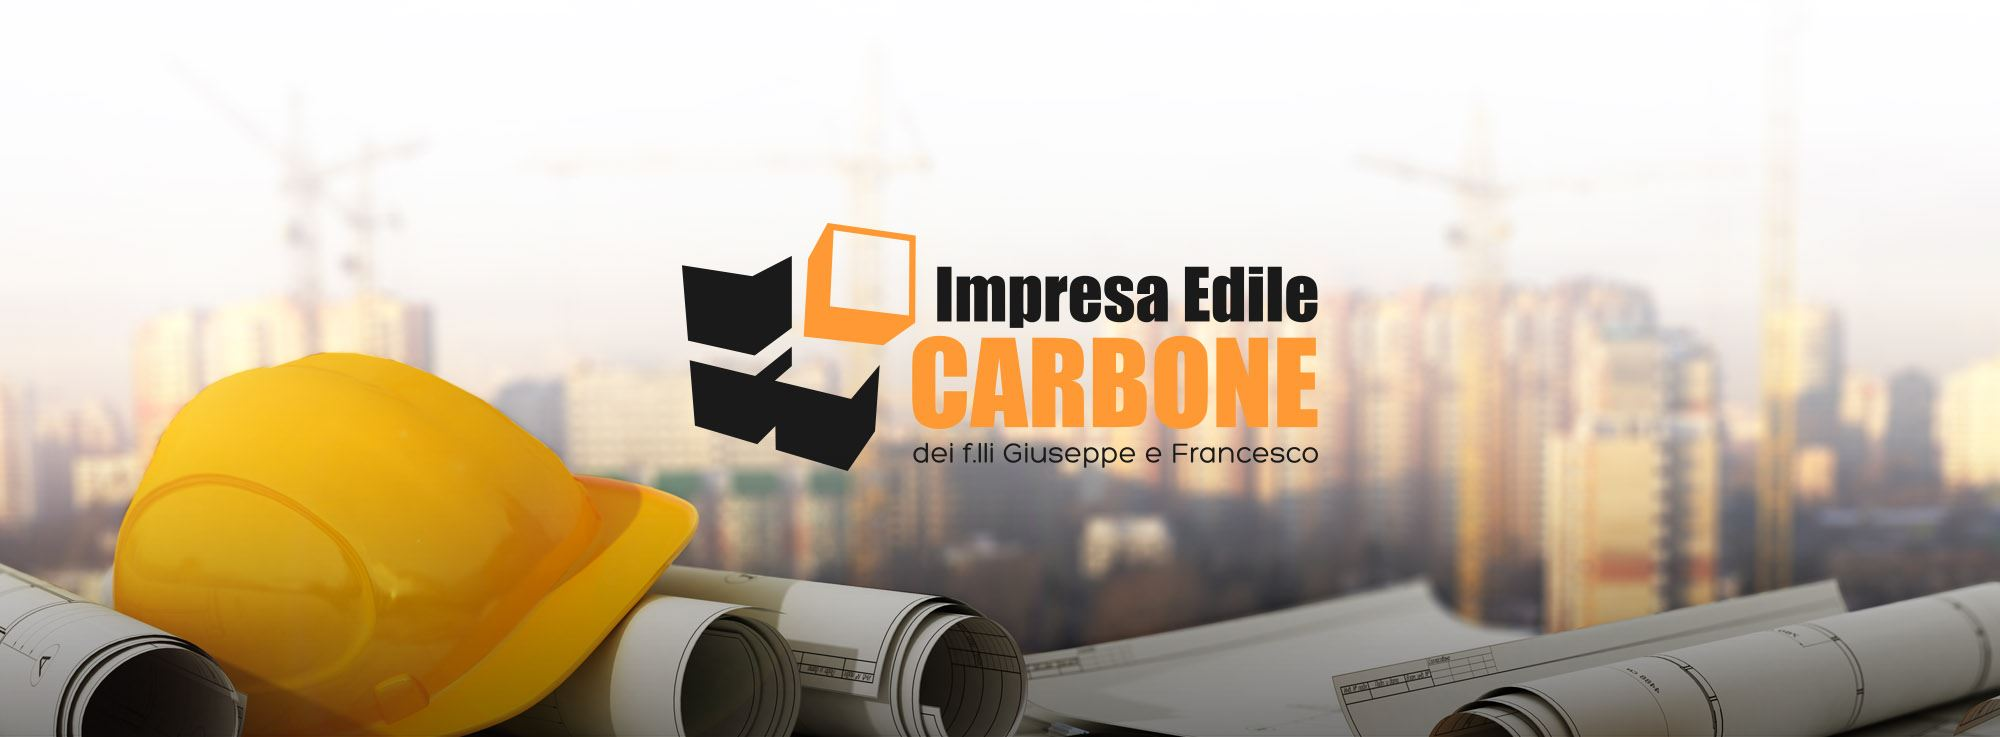 Impresa edile Carbone Barletta